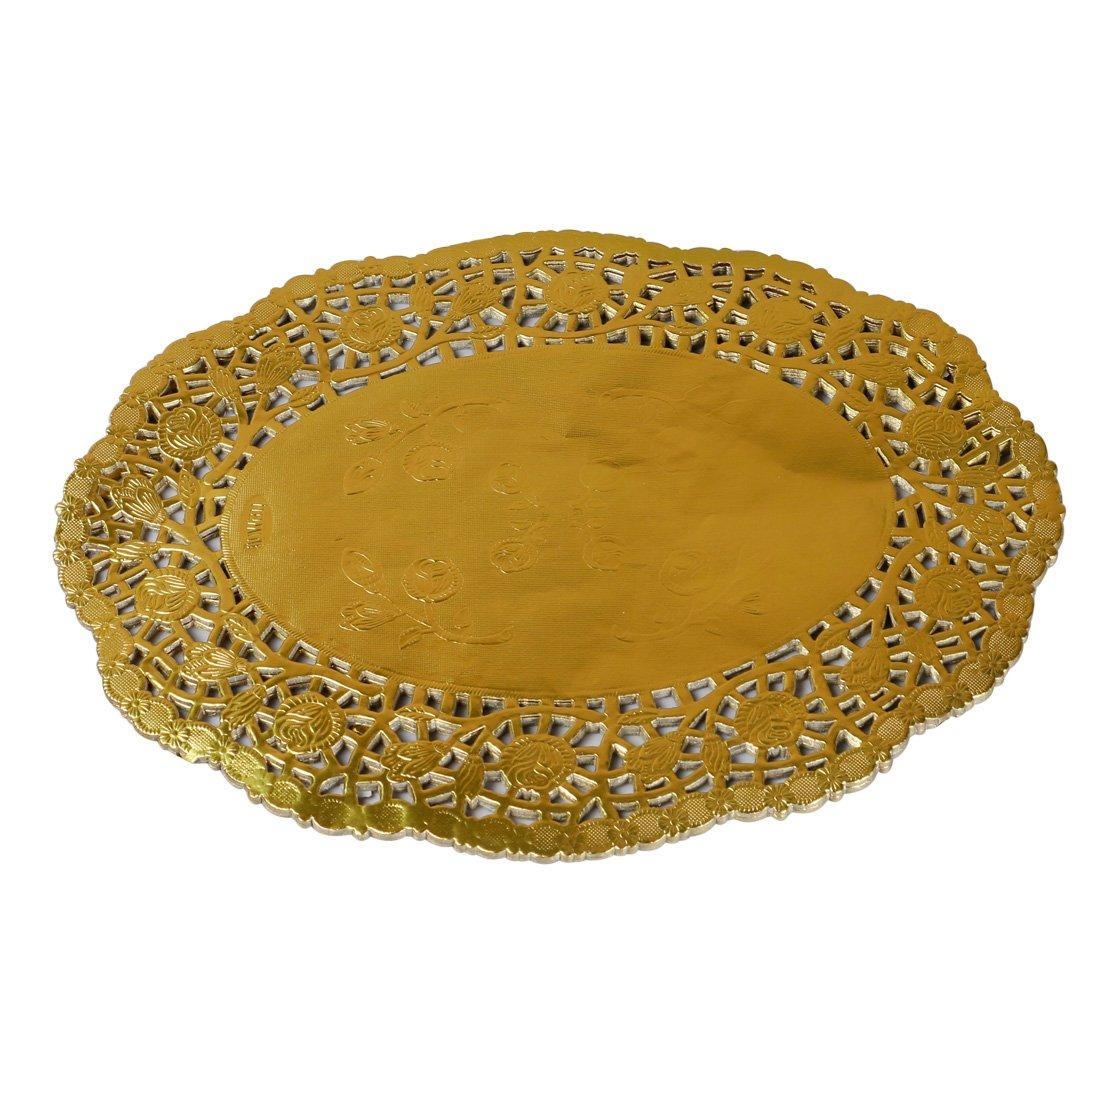 Geeklife Lace Paper Doilies, Disposable Gold Foil Oval Paper Doilies, 10.5 x 14 Inches,40 Pcs